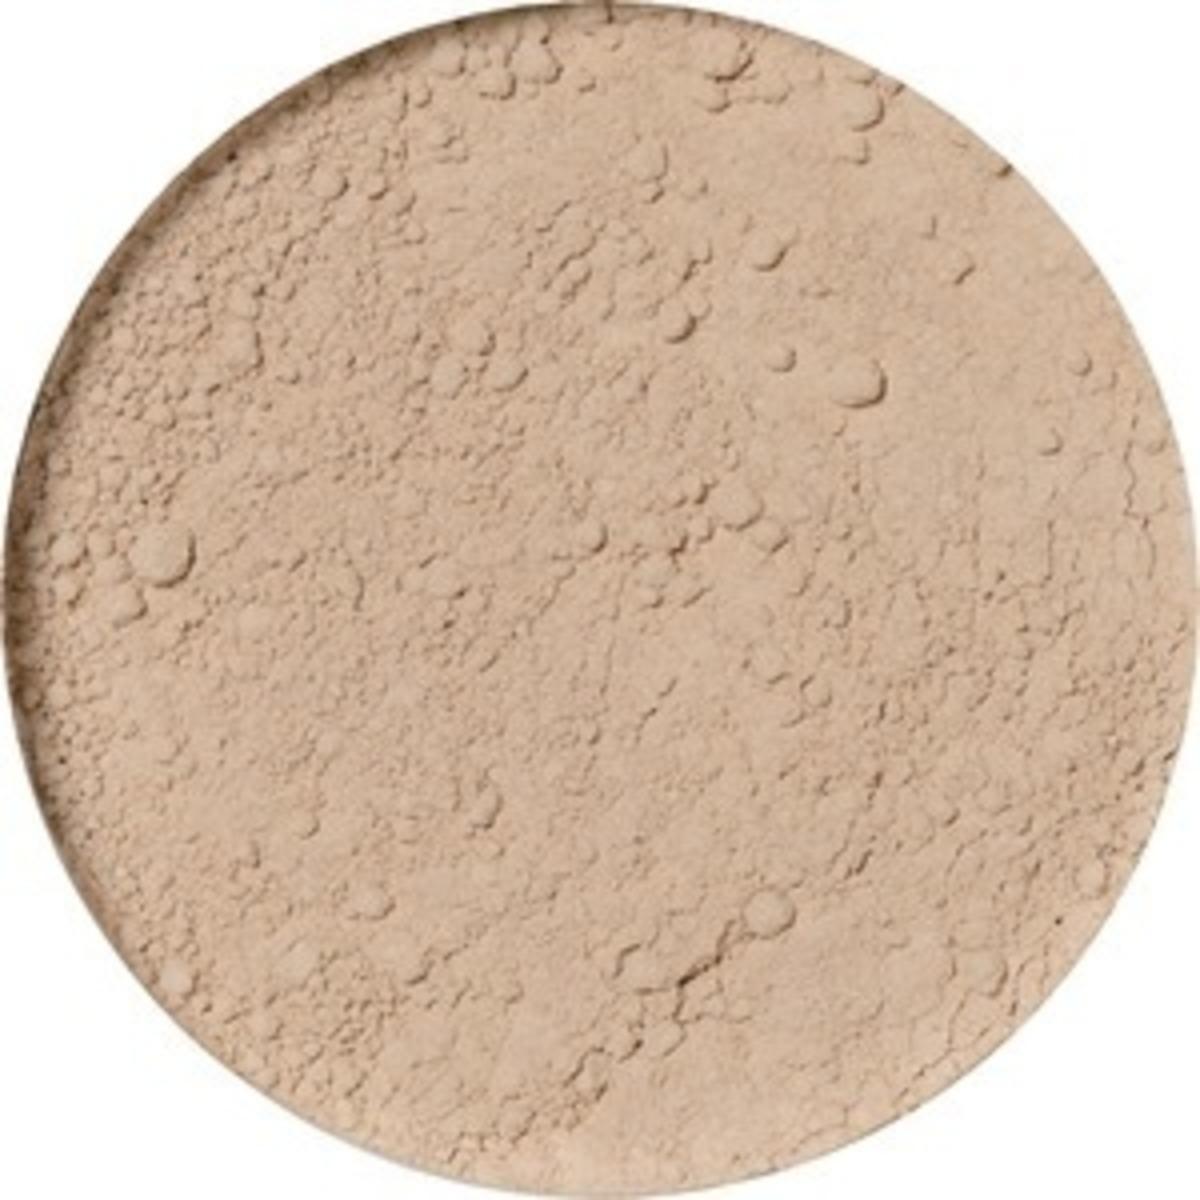 Billede af Idun Minerals Powder Foundation - Saga - 30 ml